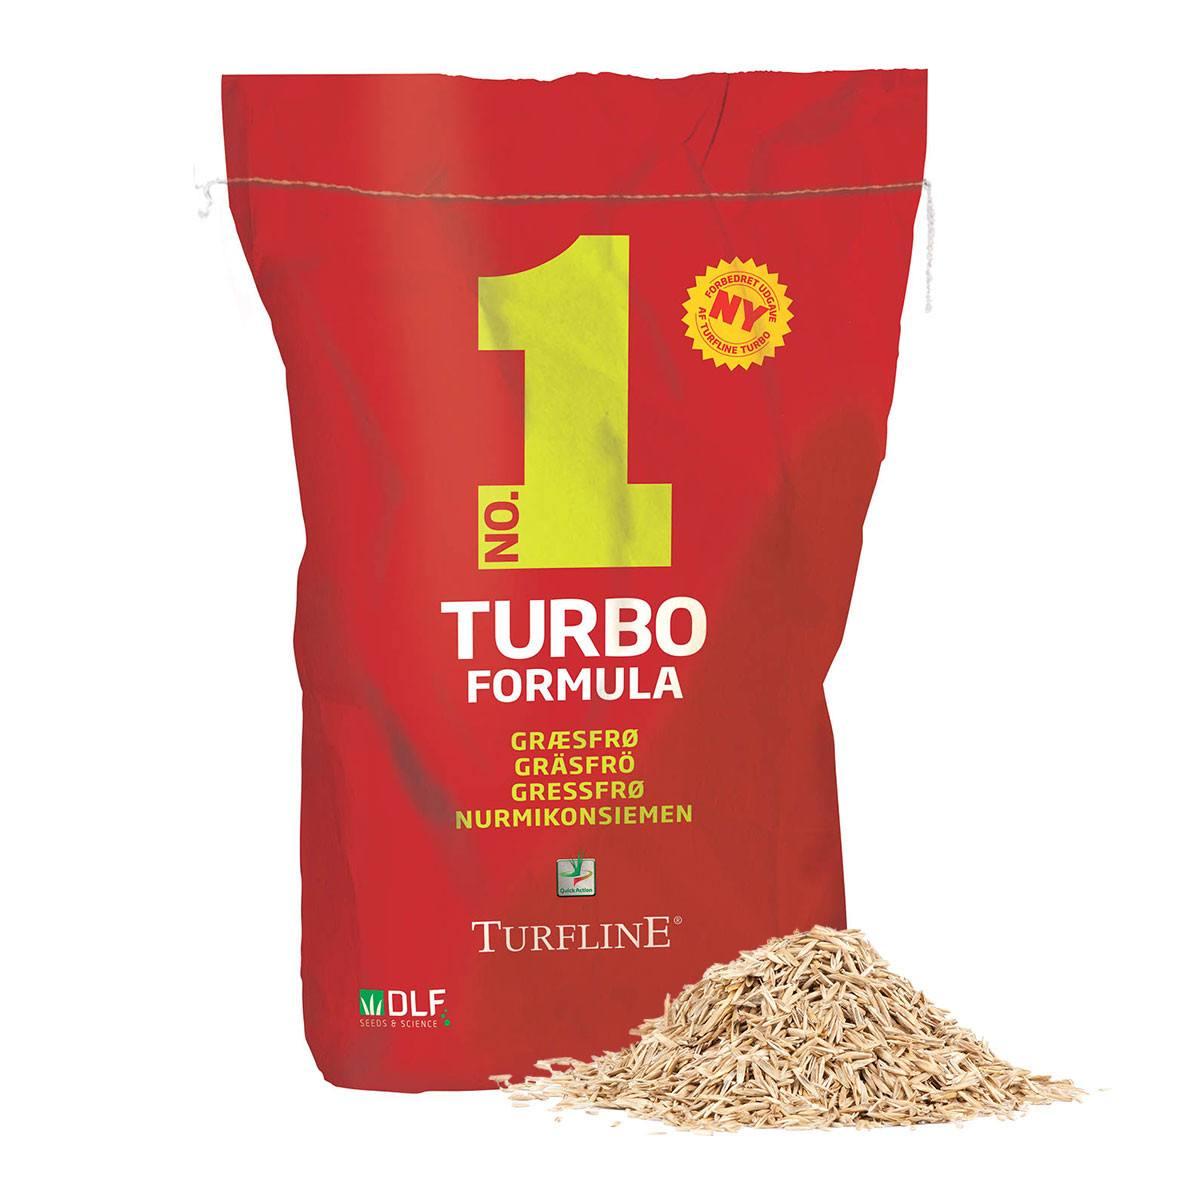 Turfline No. 1 TURBO Formula græsfrø - 7,5 kg. / 375 m2